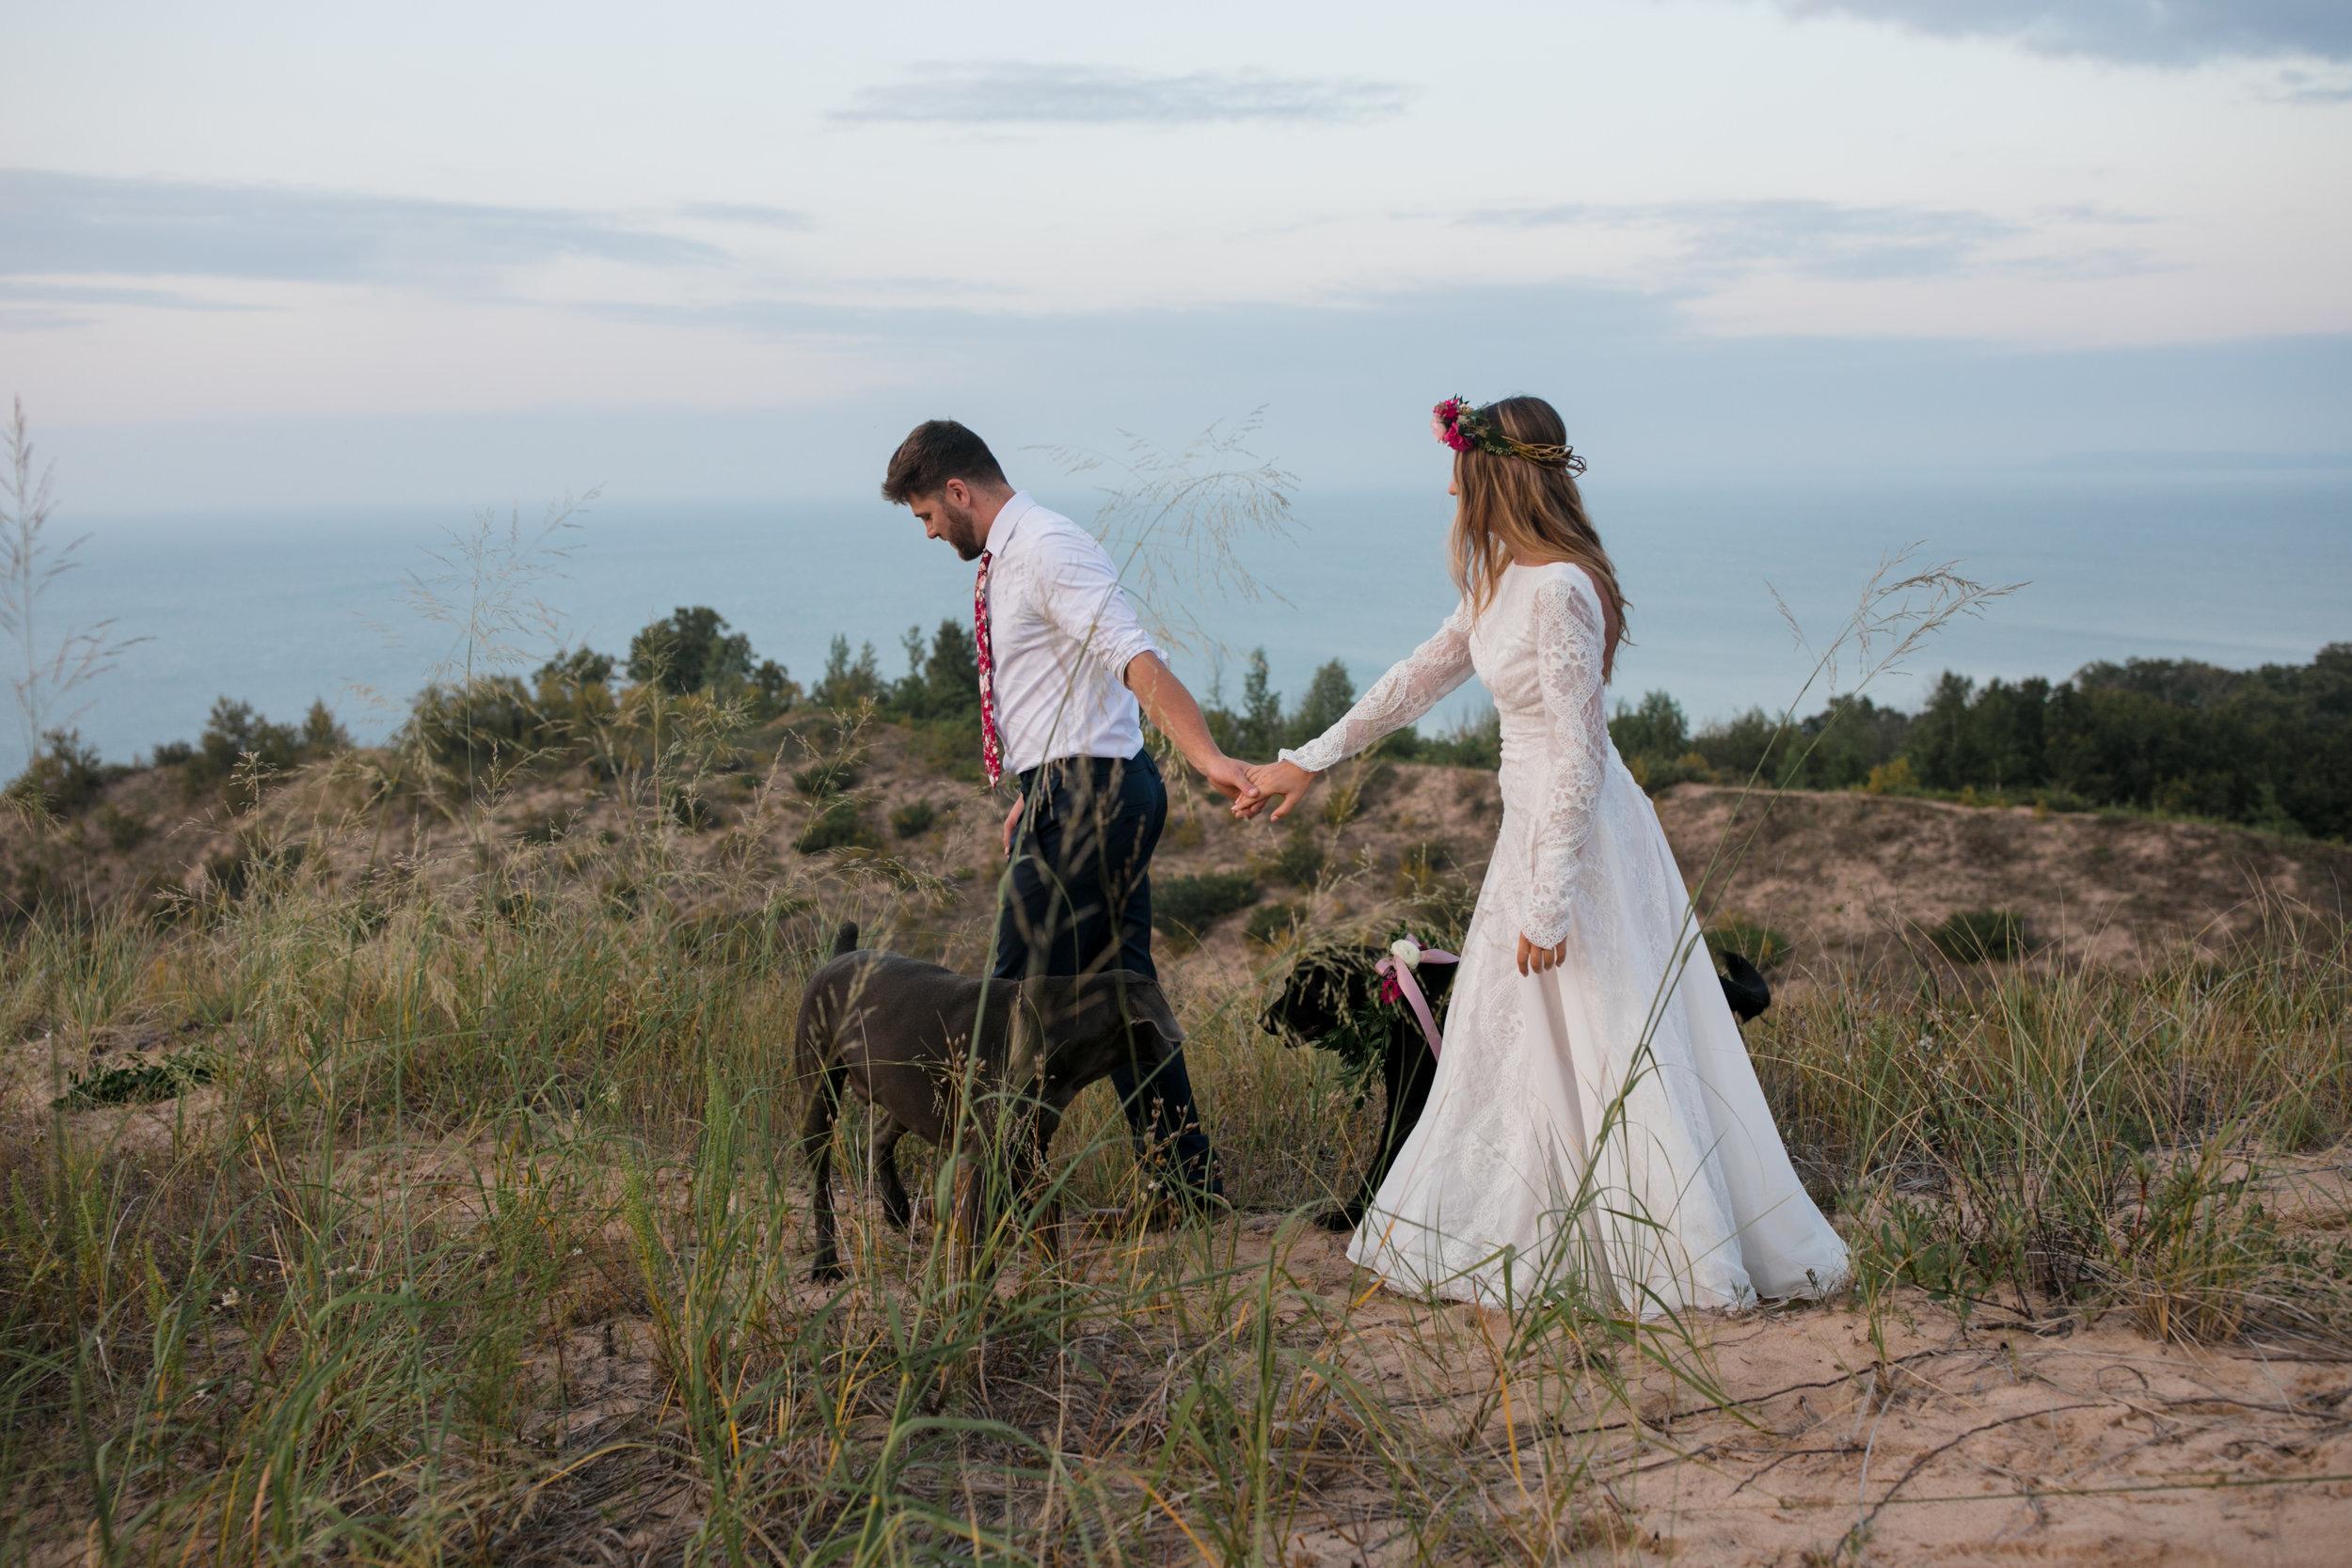 michigan-emotive-photographer-moonlight-elopement-mariha-hunter-130.jpg